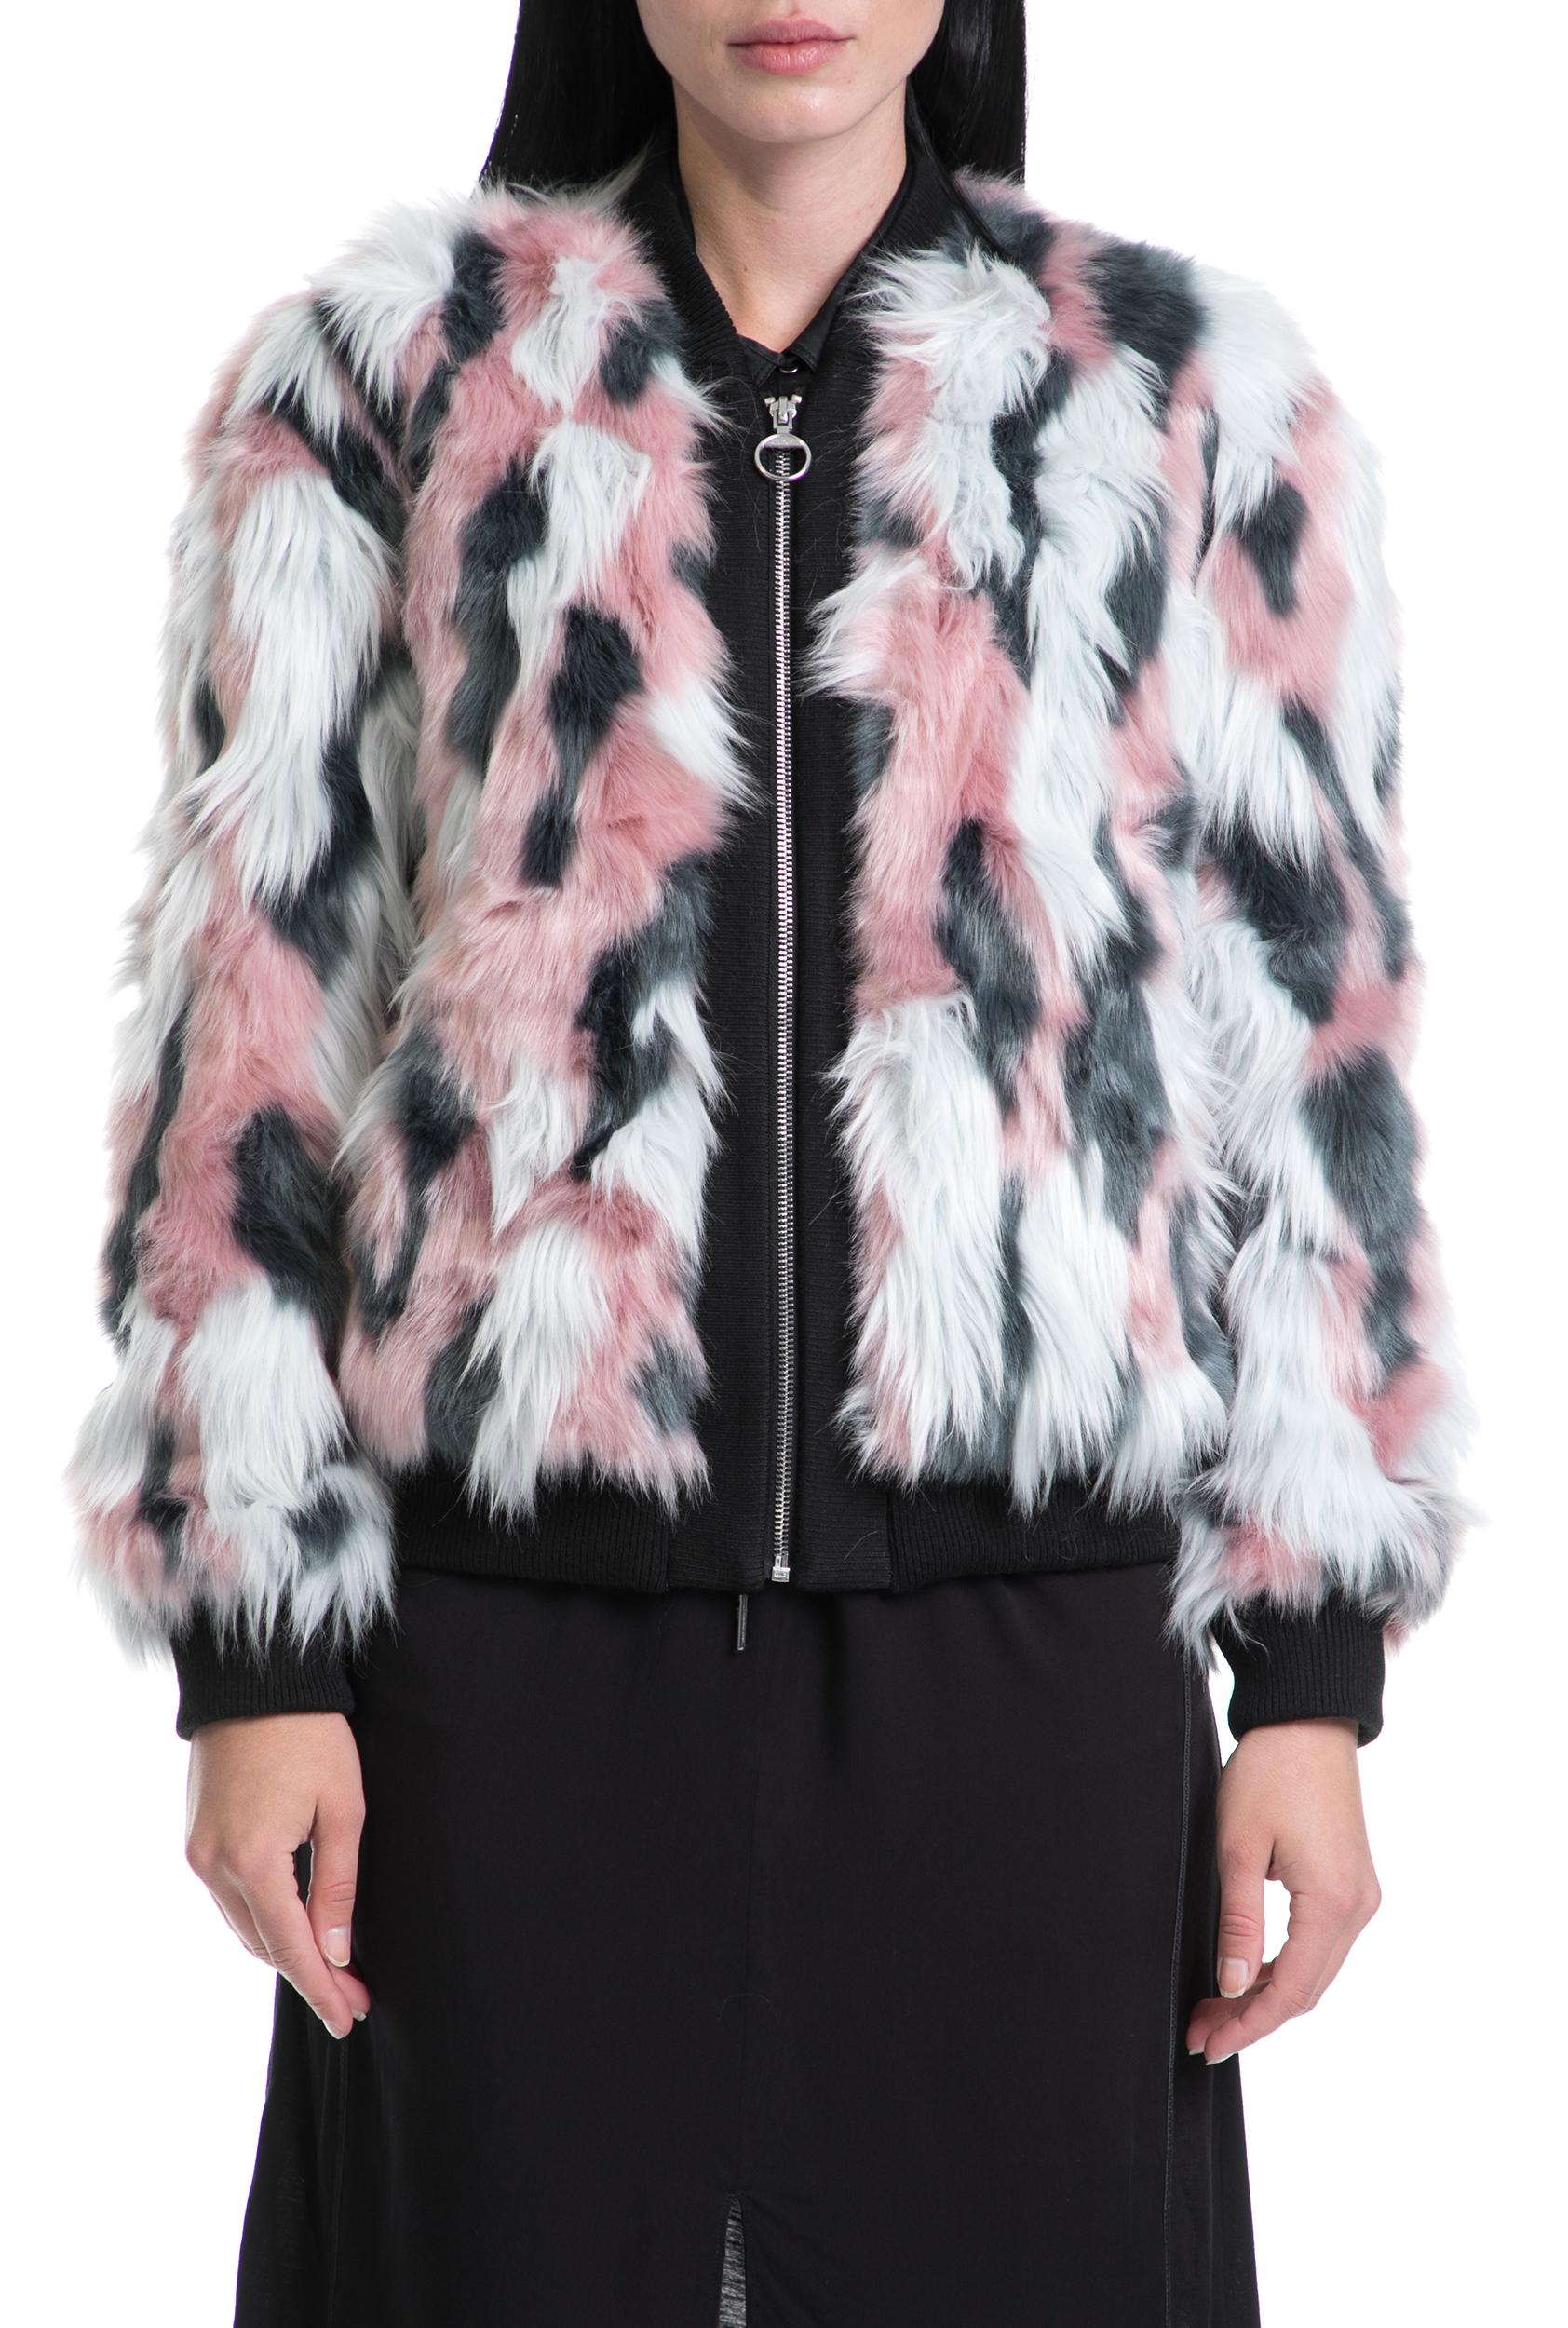 f024aa659f6a JUICY COUTURE - Γυναικείο παλτό JUICY COUTURE ροζ-άσπρο-μαύρο